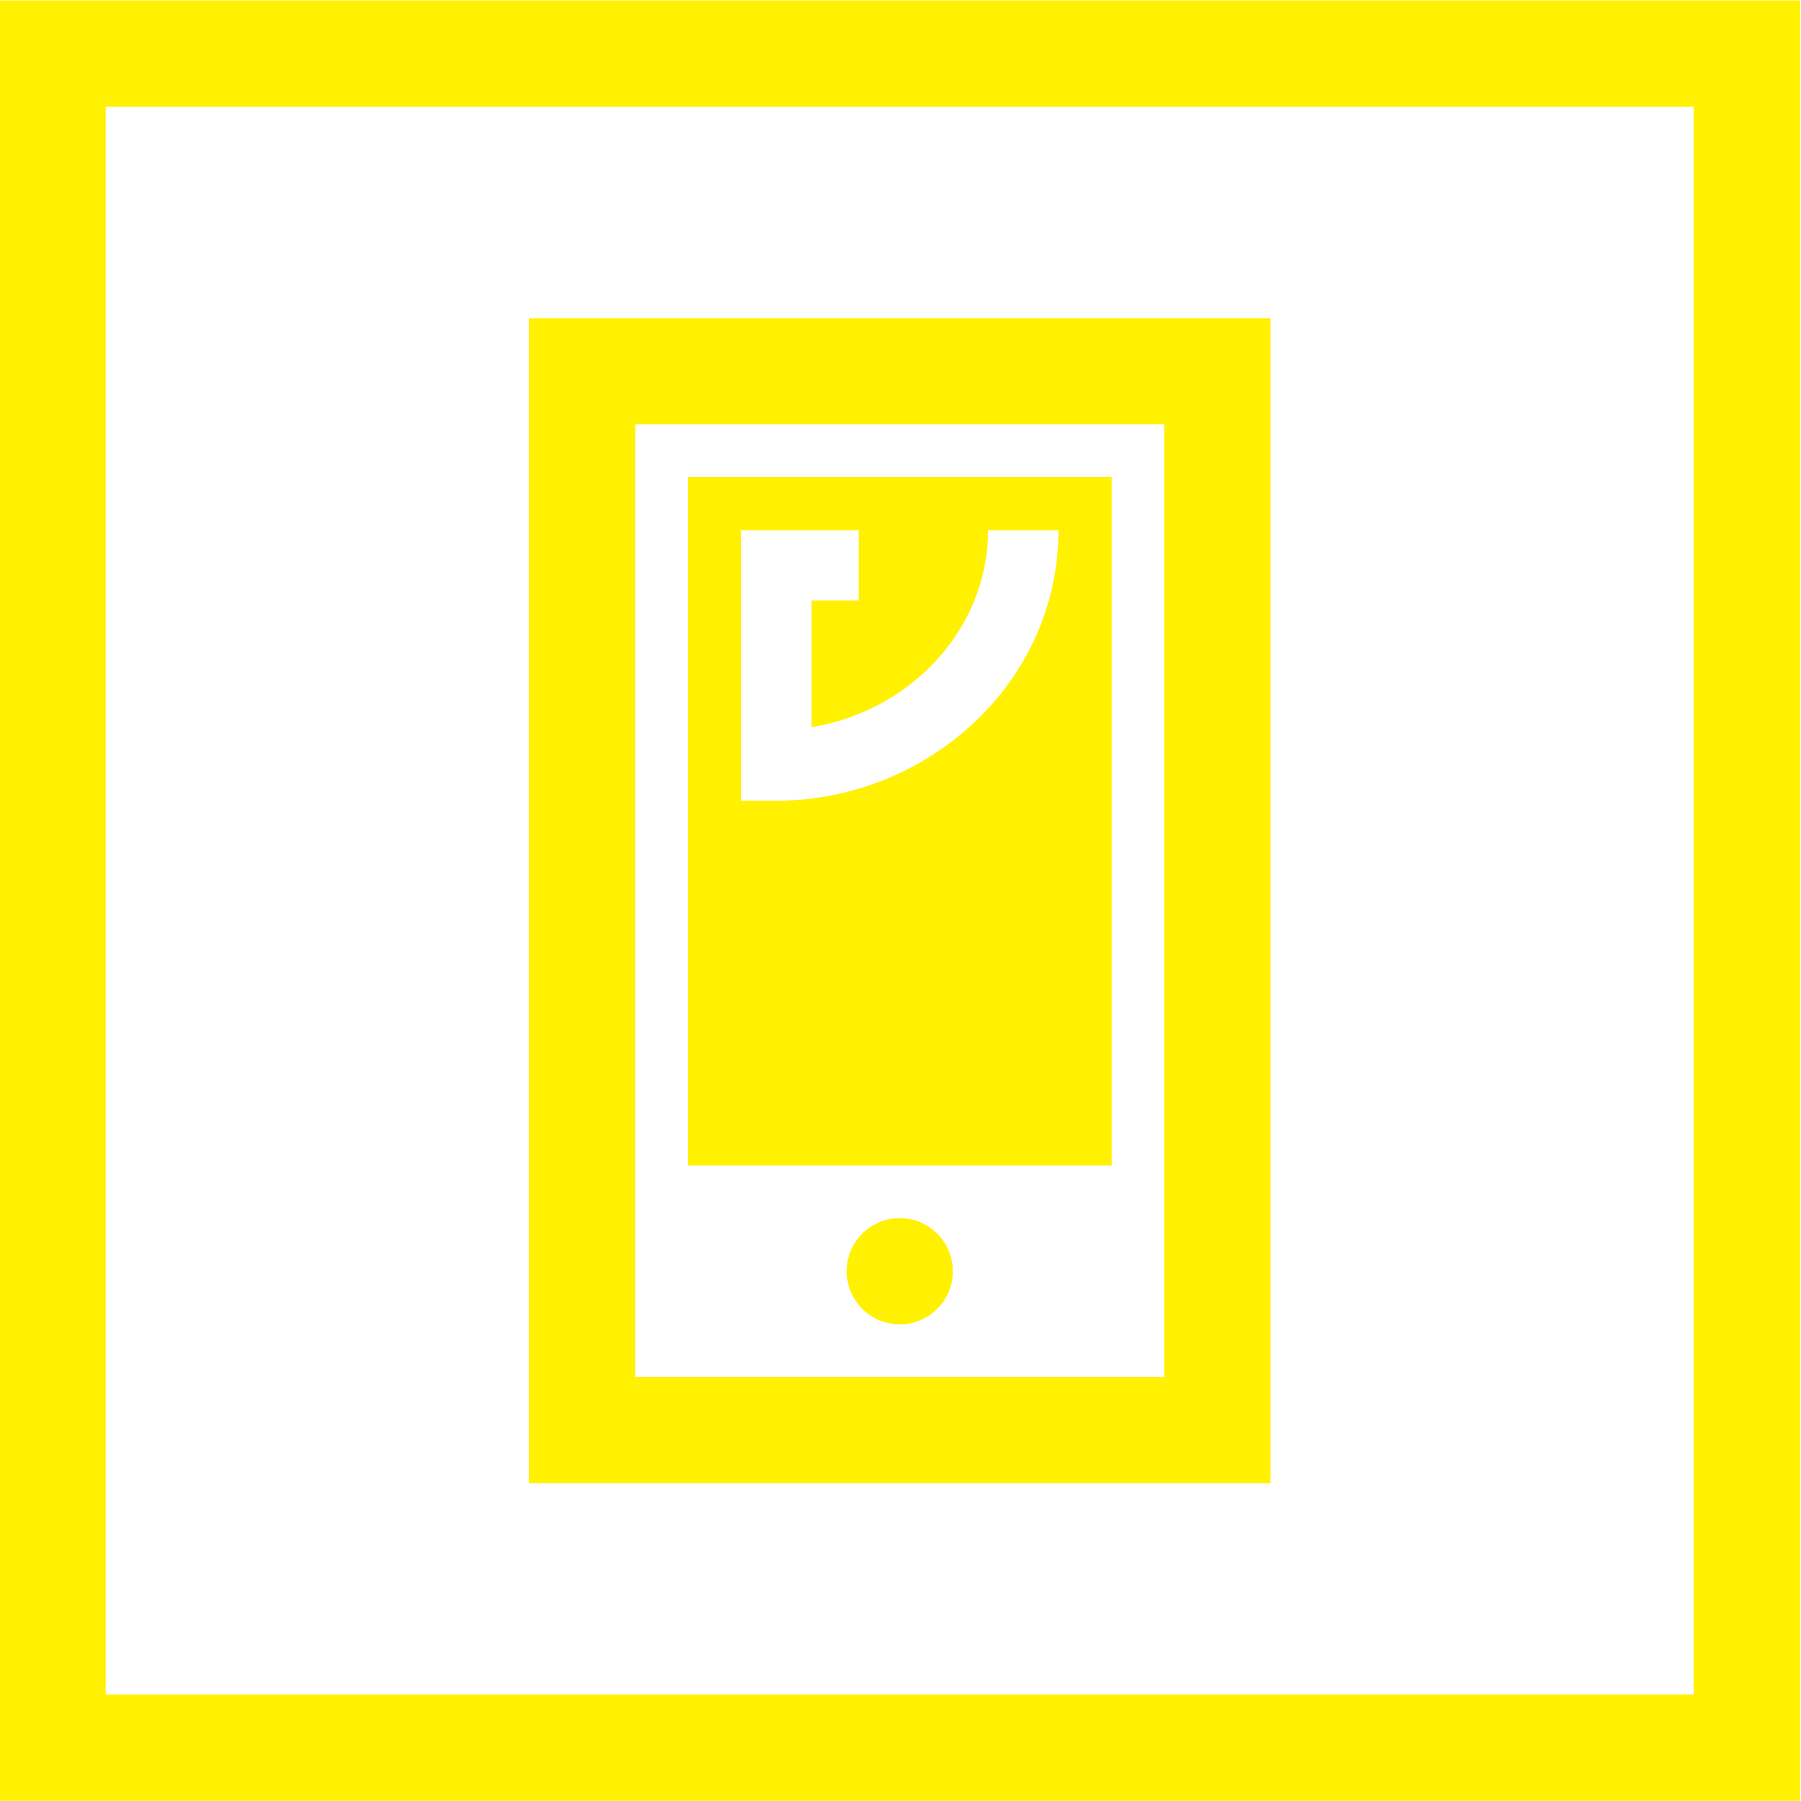 virta_icons_app_yellow.png